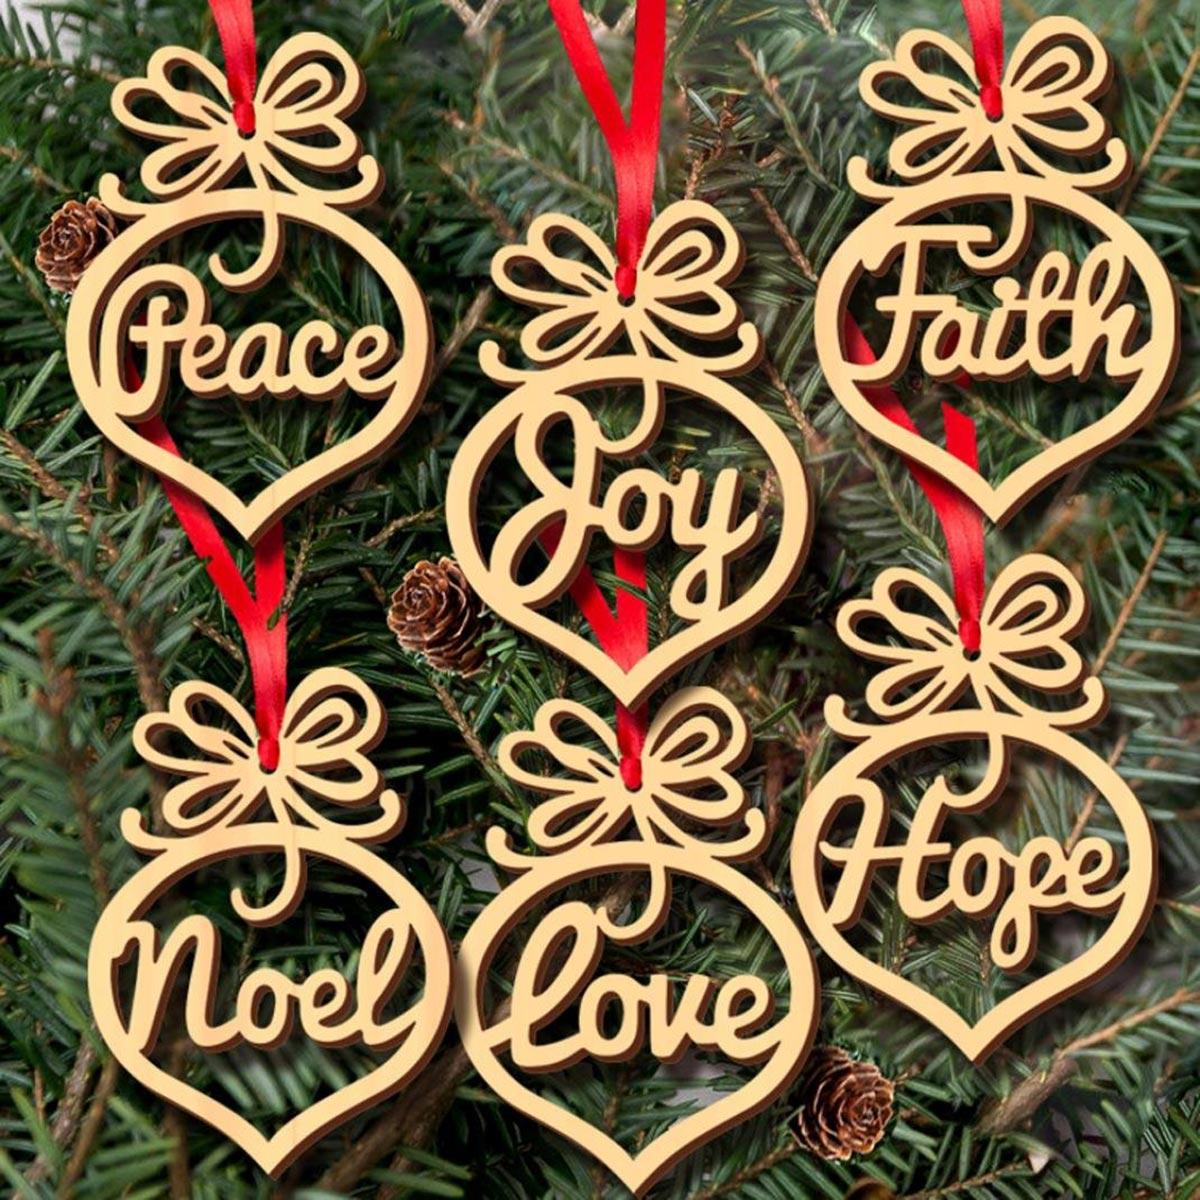 30 Best Indoor Outdoor Christmas Decorations Amp Ornaments